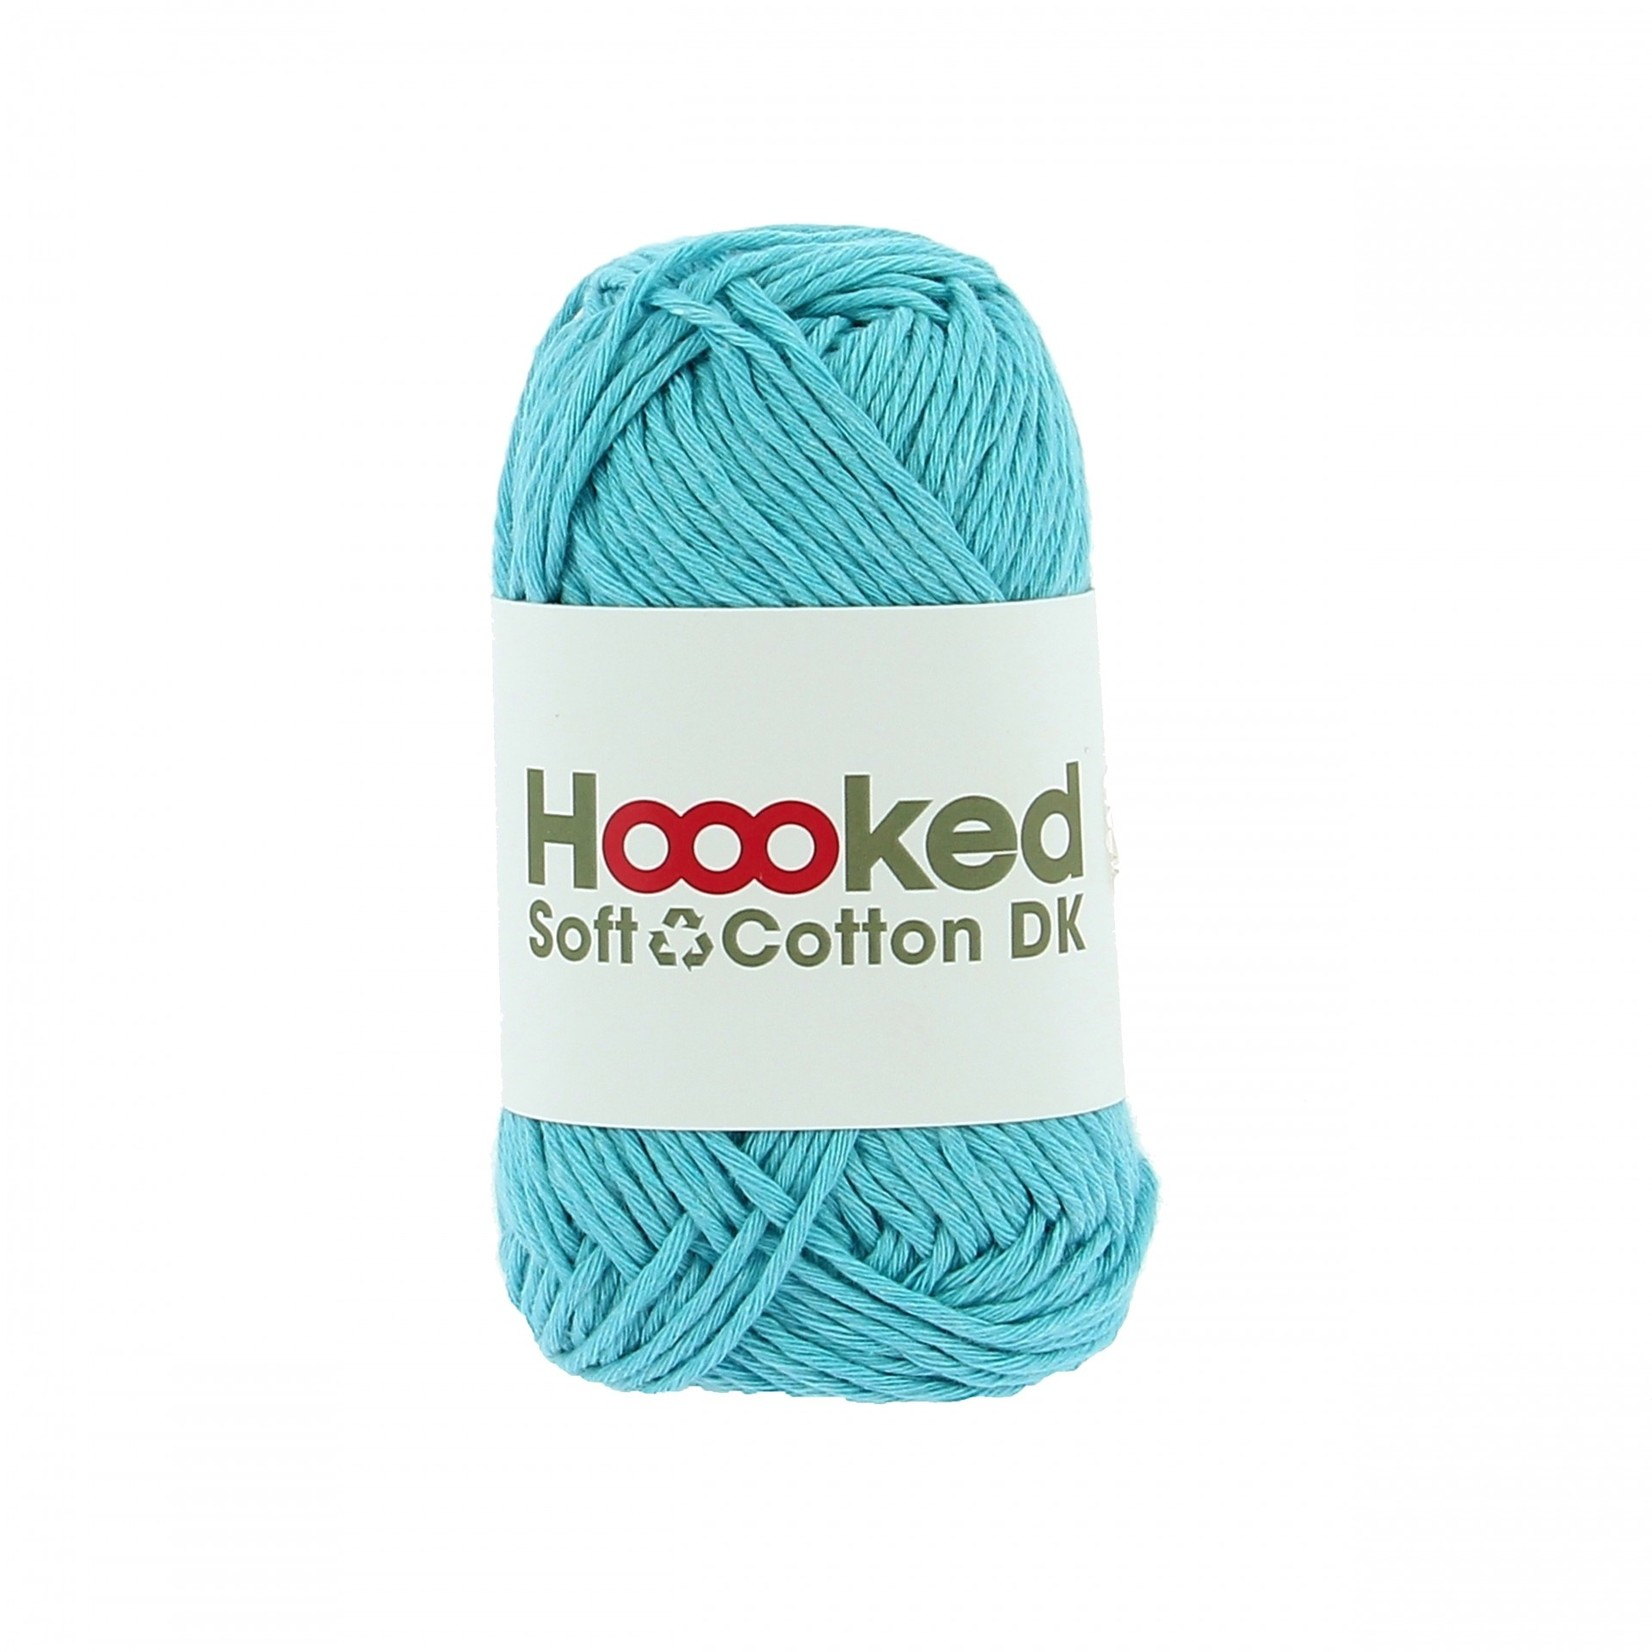 Hoooked Hoooked Soft Cotton DK Sydney Sea 50 gr. / 85 m.